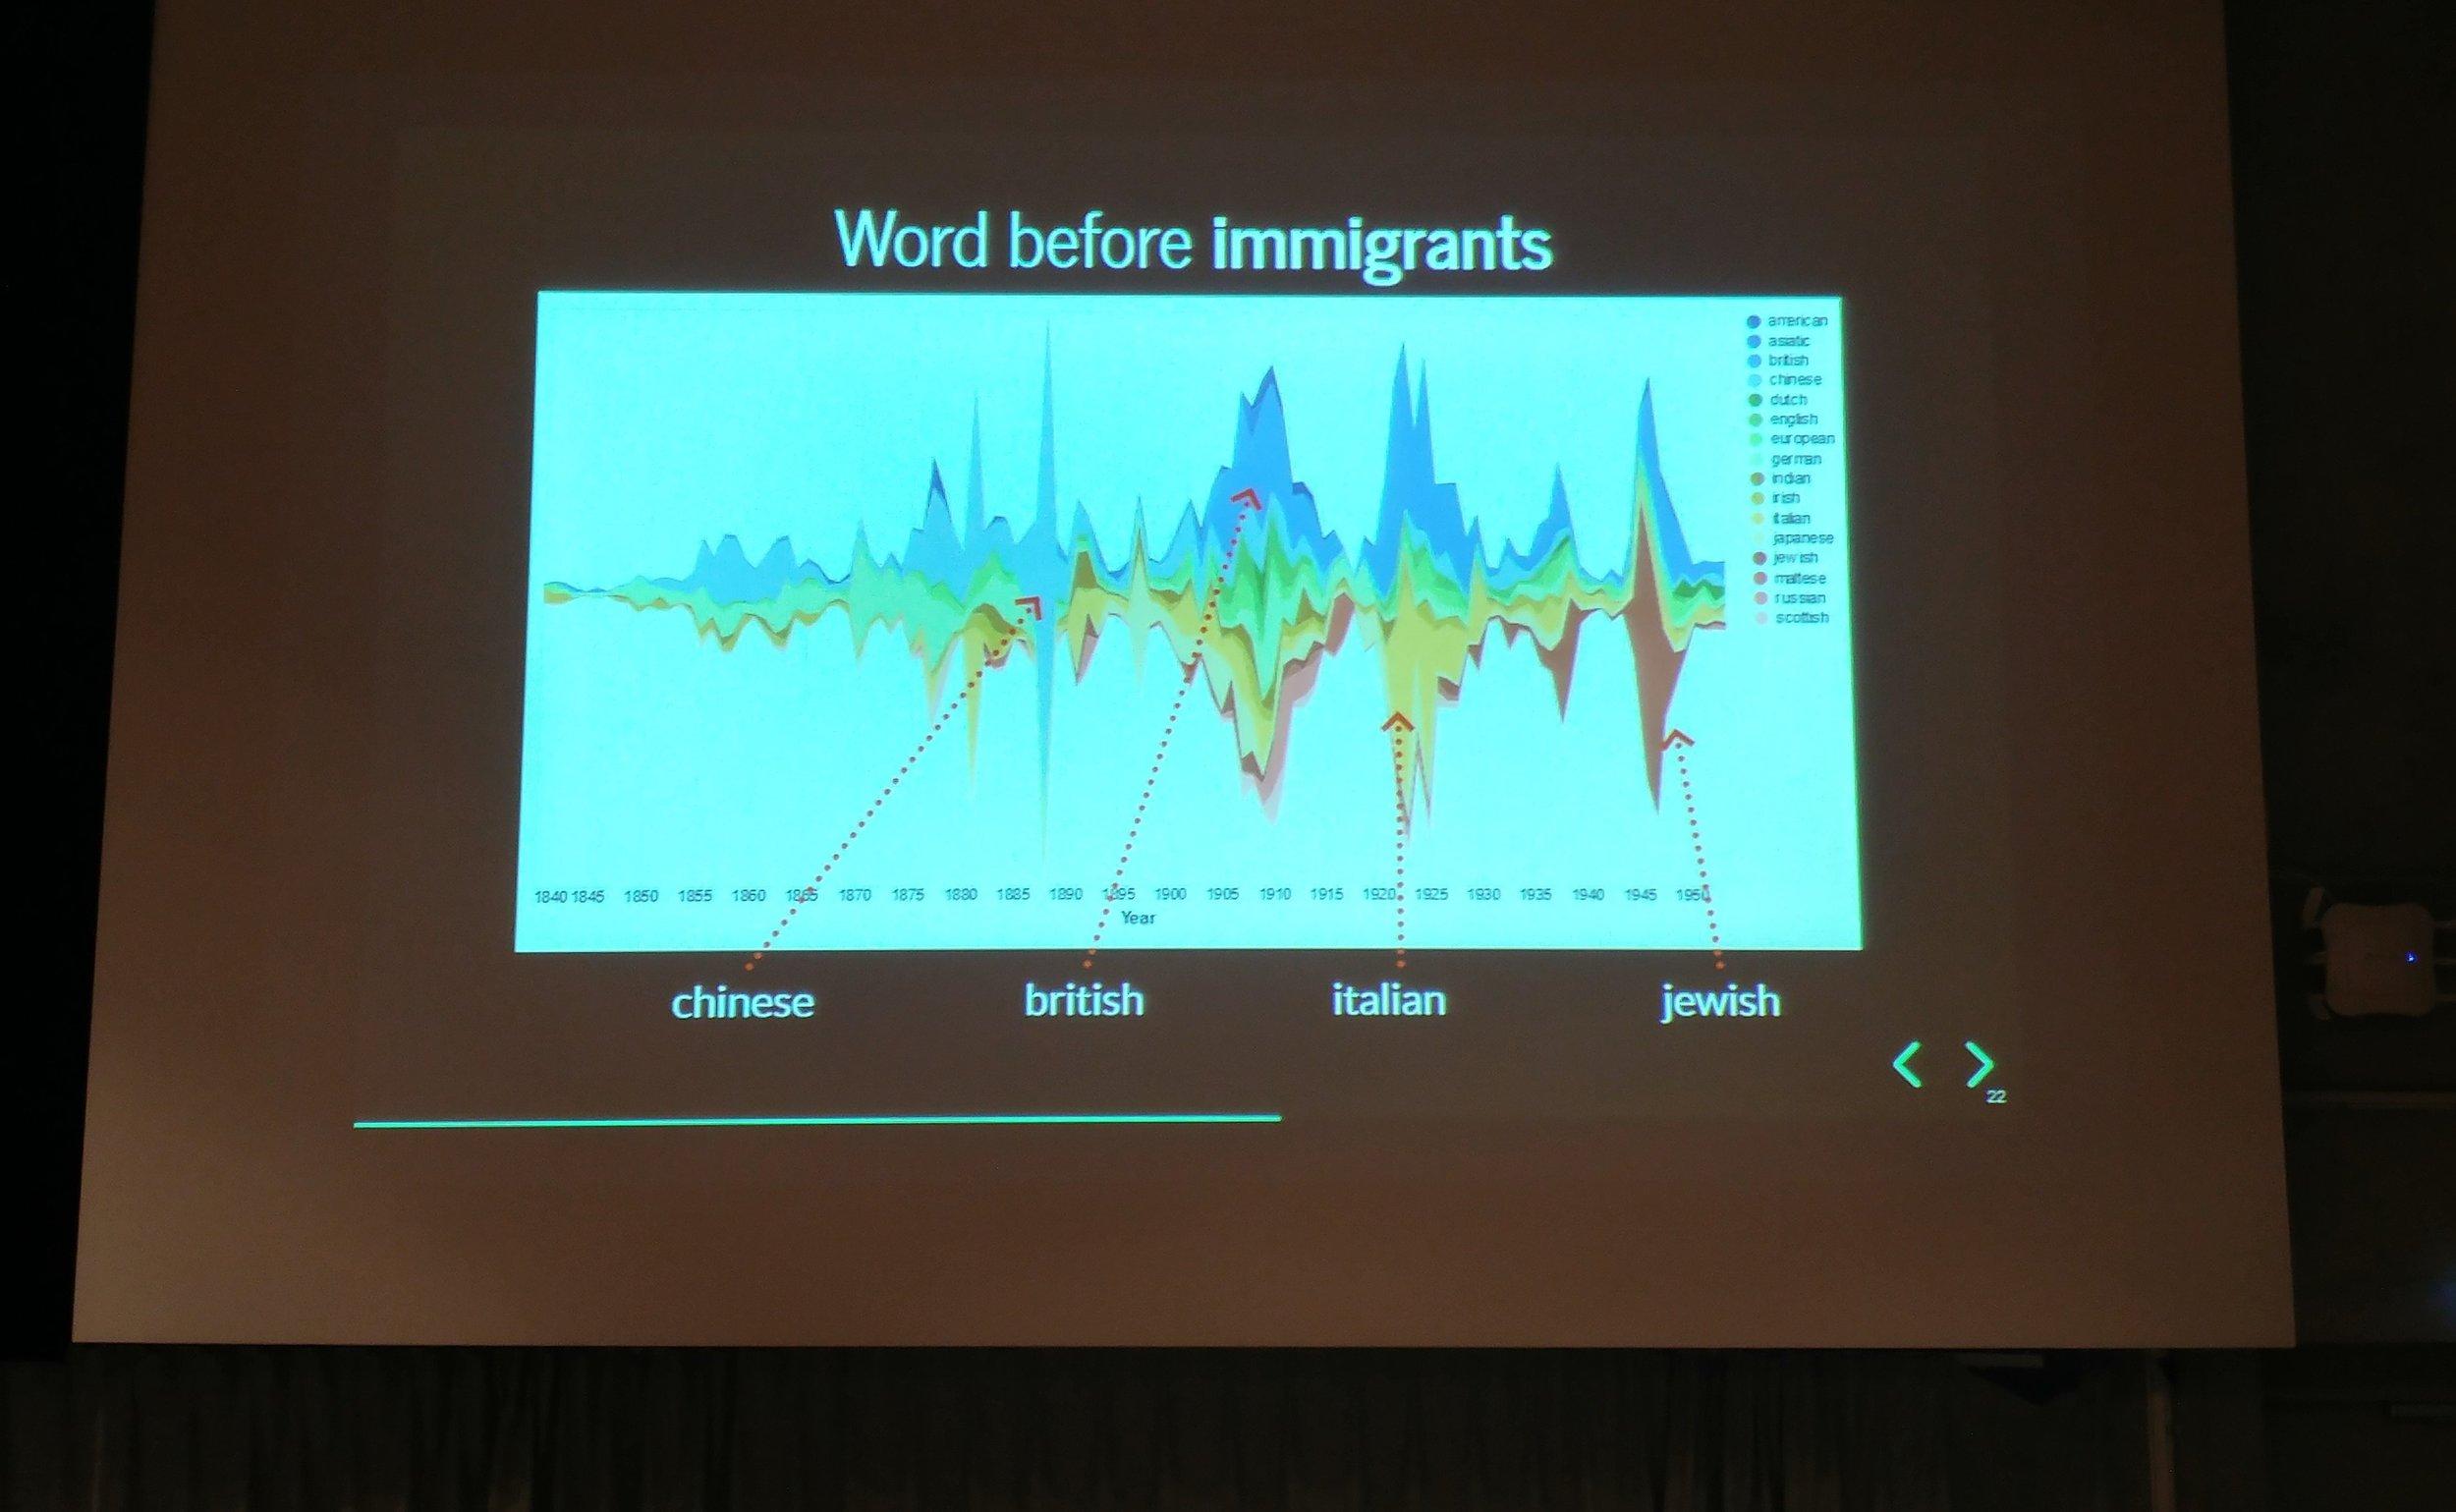 Tim Sheratt's presentation on analyzing changes in the language of belonging